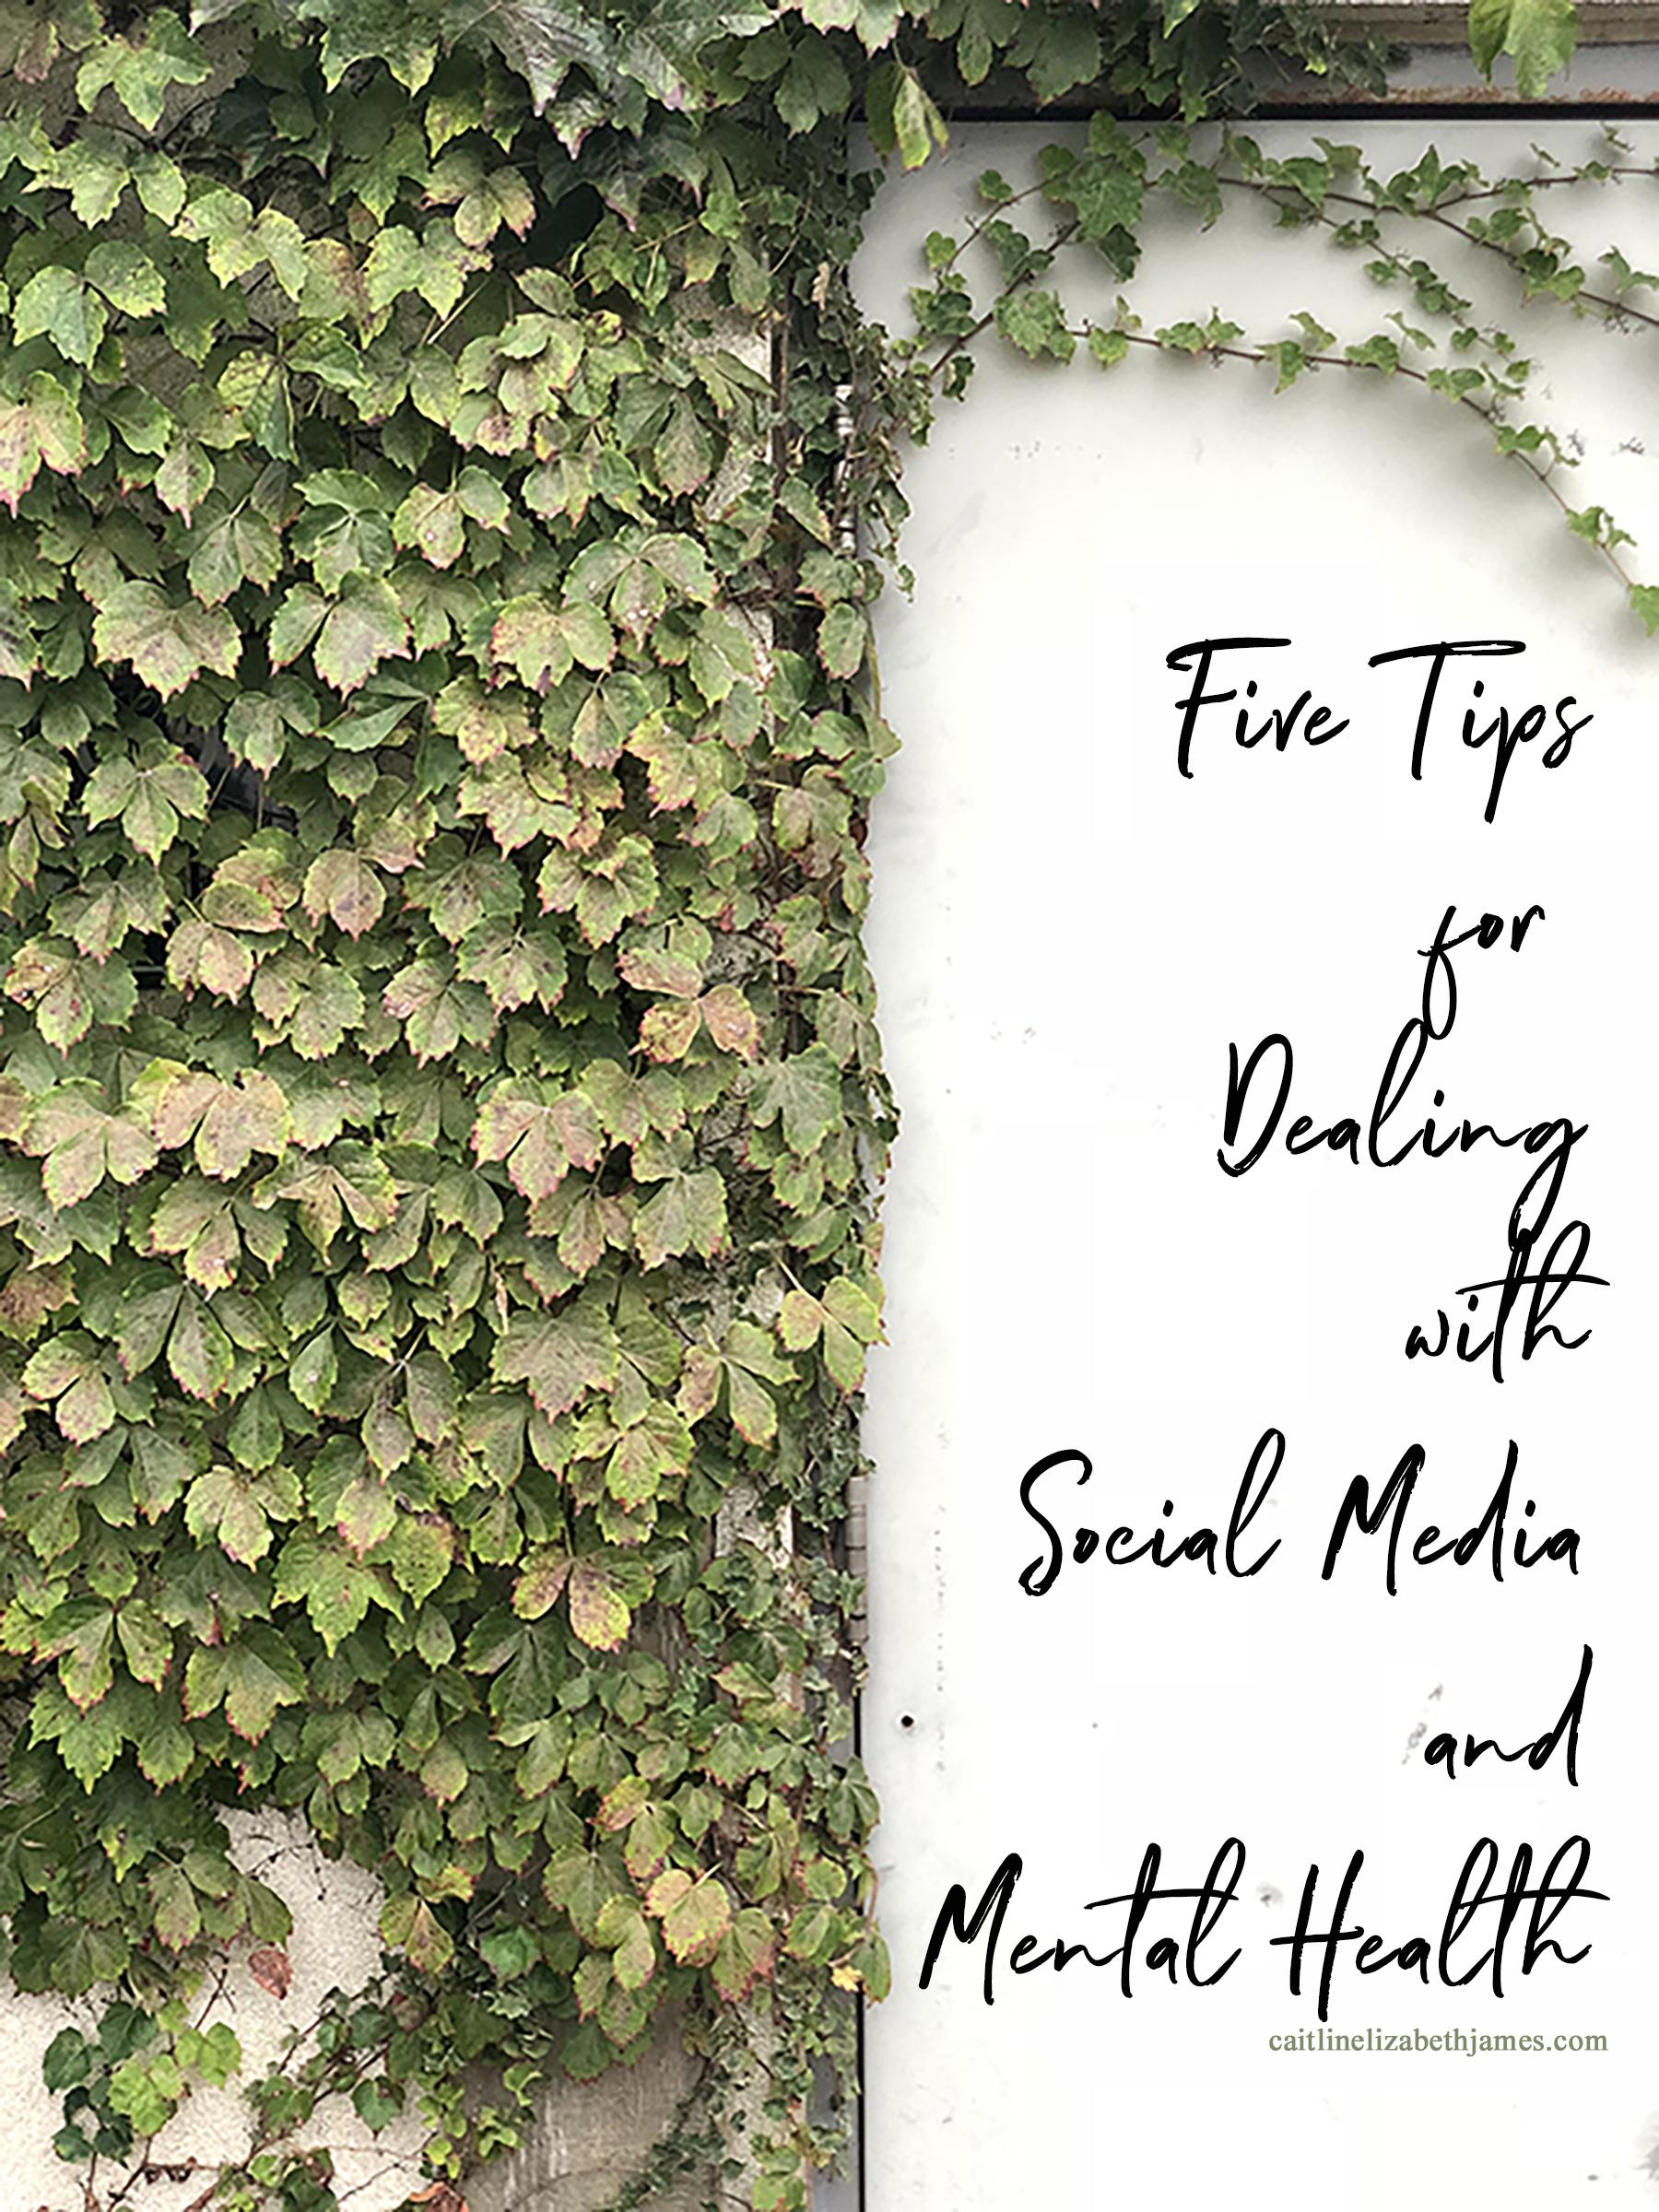 social media and mental health-caitlin james-blog-tips-self care-self help.jpg